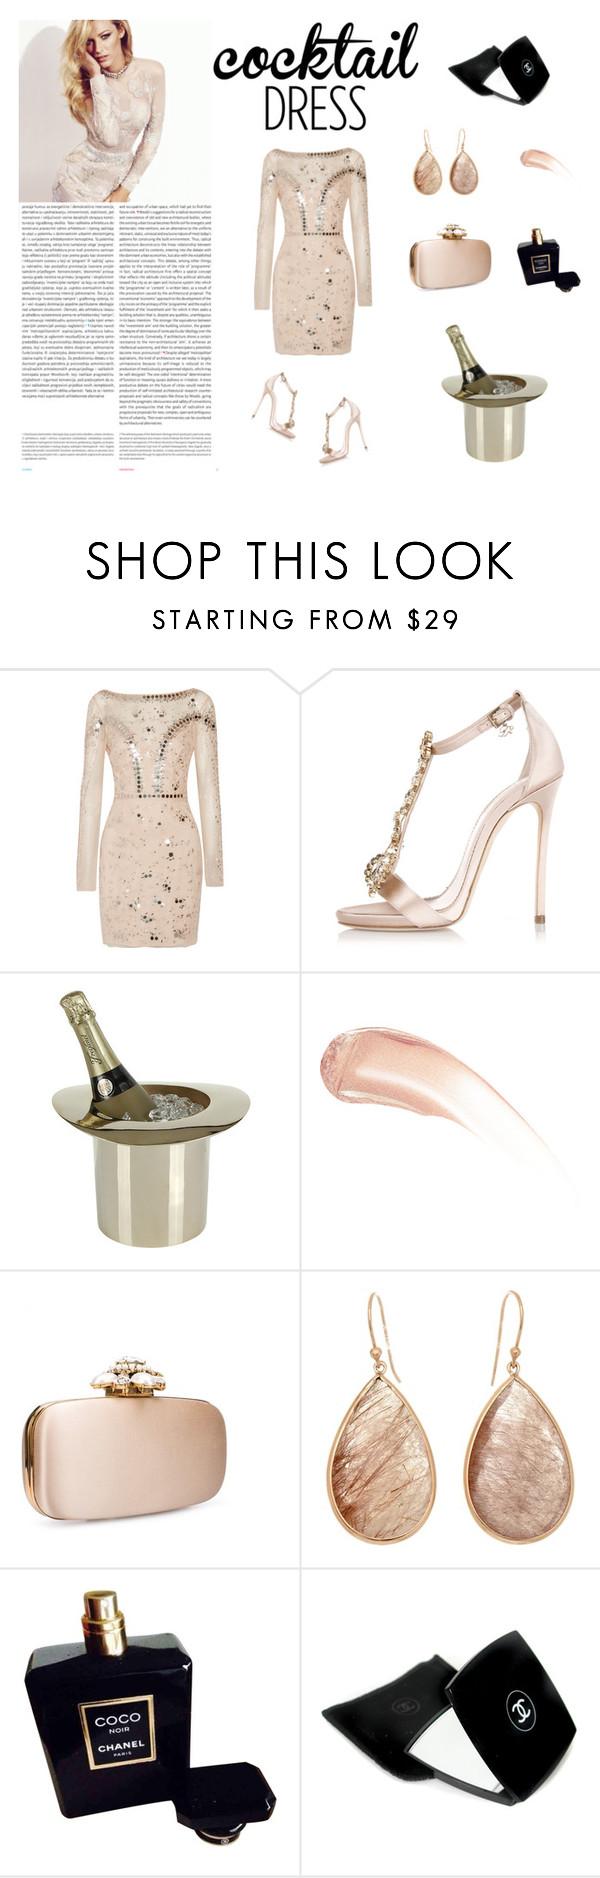 """Untitled #79"" by krisztismind ❤ liked on Polyvore featuring mode, Temperley London, Dsquared2, Lunares, Wander Beauty, Oscar de la Renta, Oris, Chanel, cocktaildress en luxury"